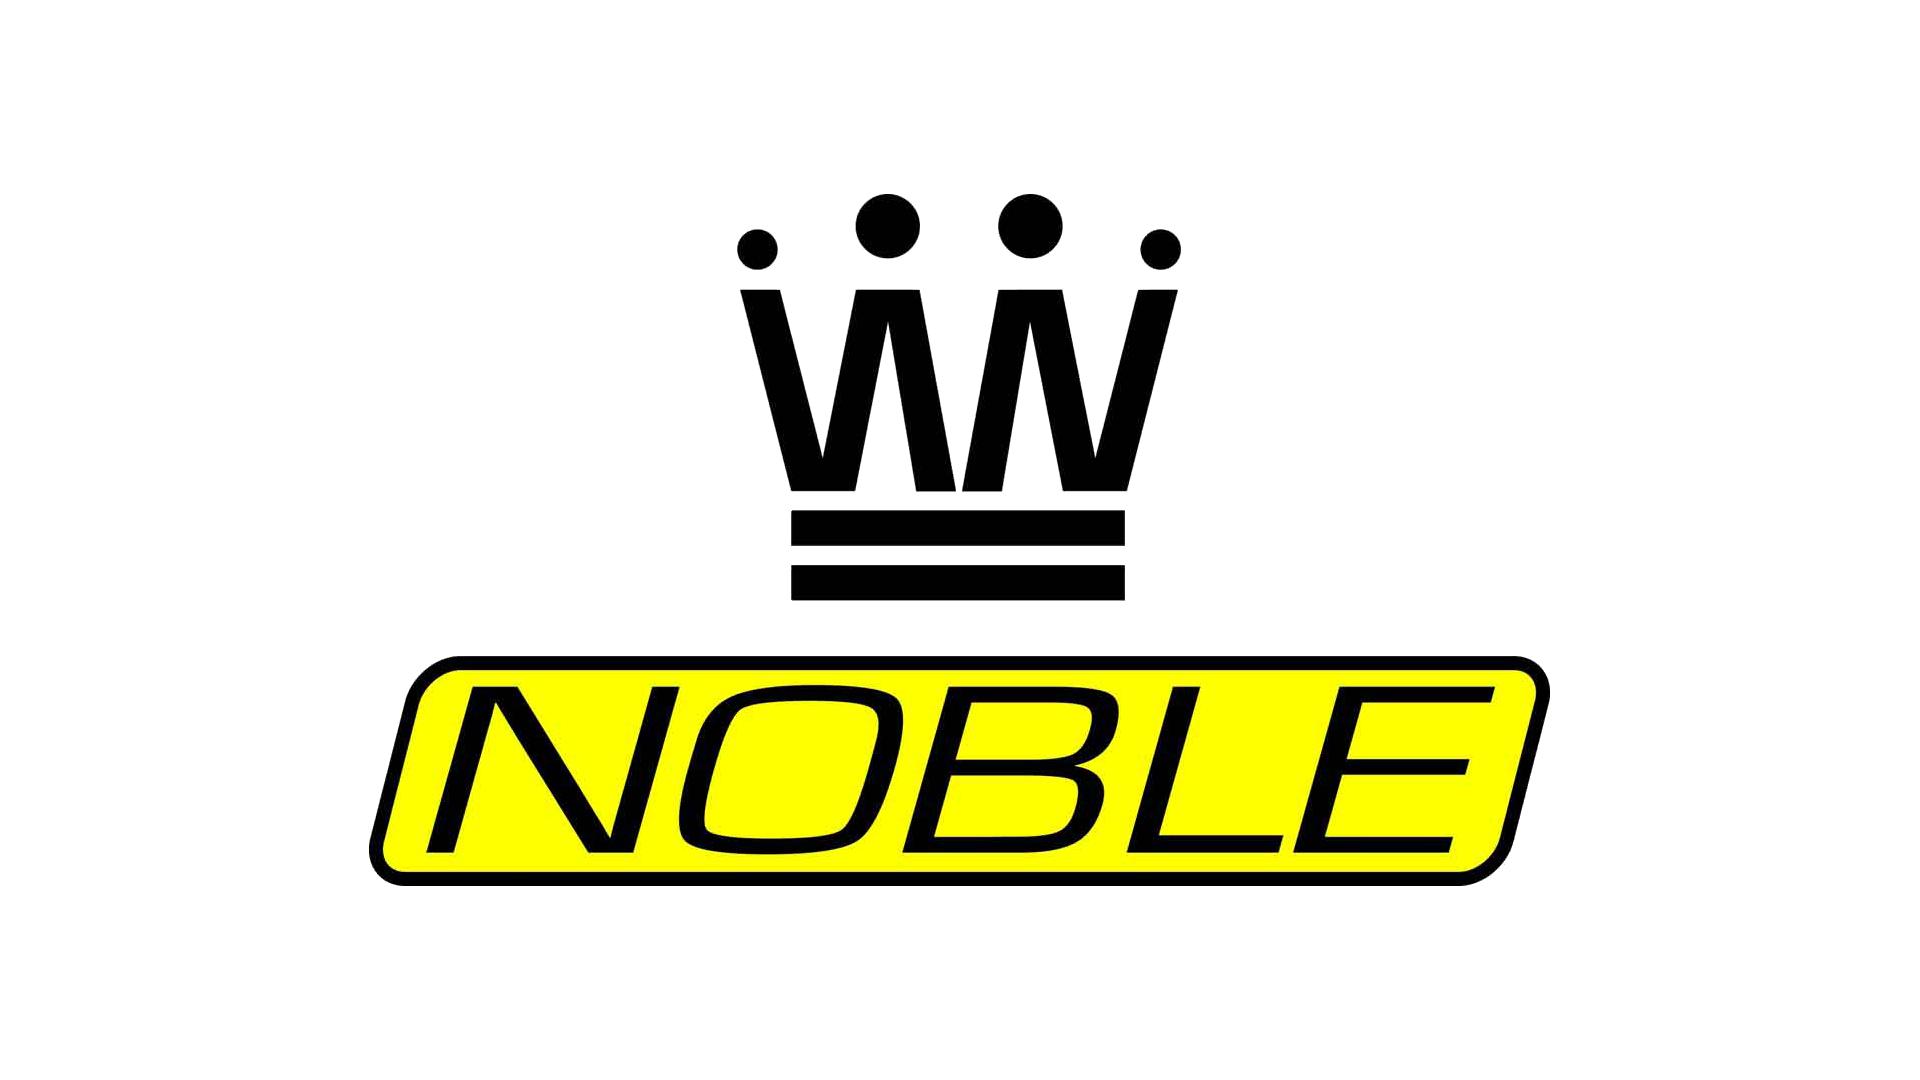 Noble Logo X HD Png Automobile Logos Pinterest Car - Car sign with namescar logos and names cars pinterest car logos cars and